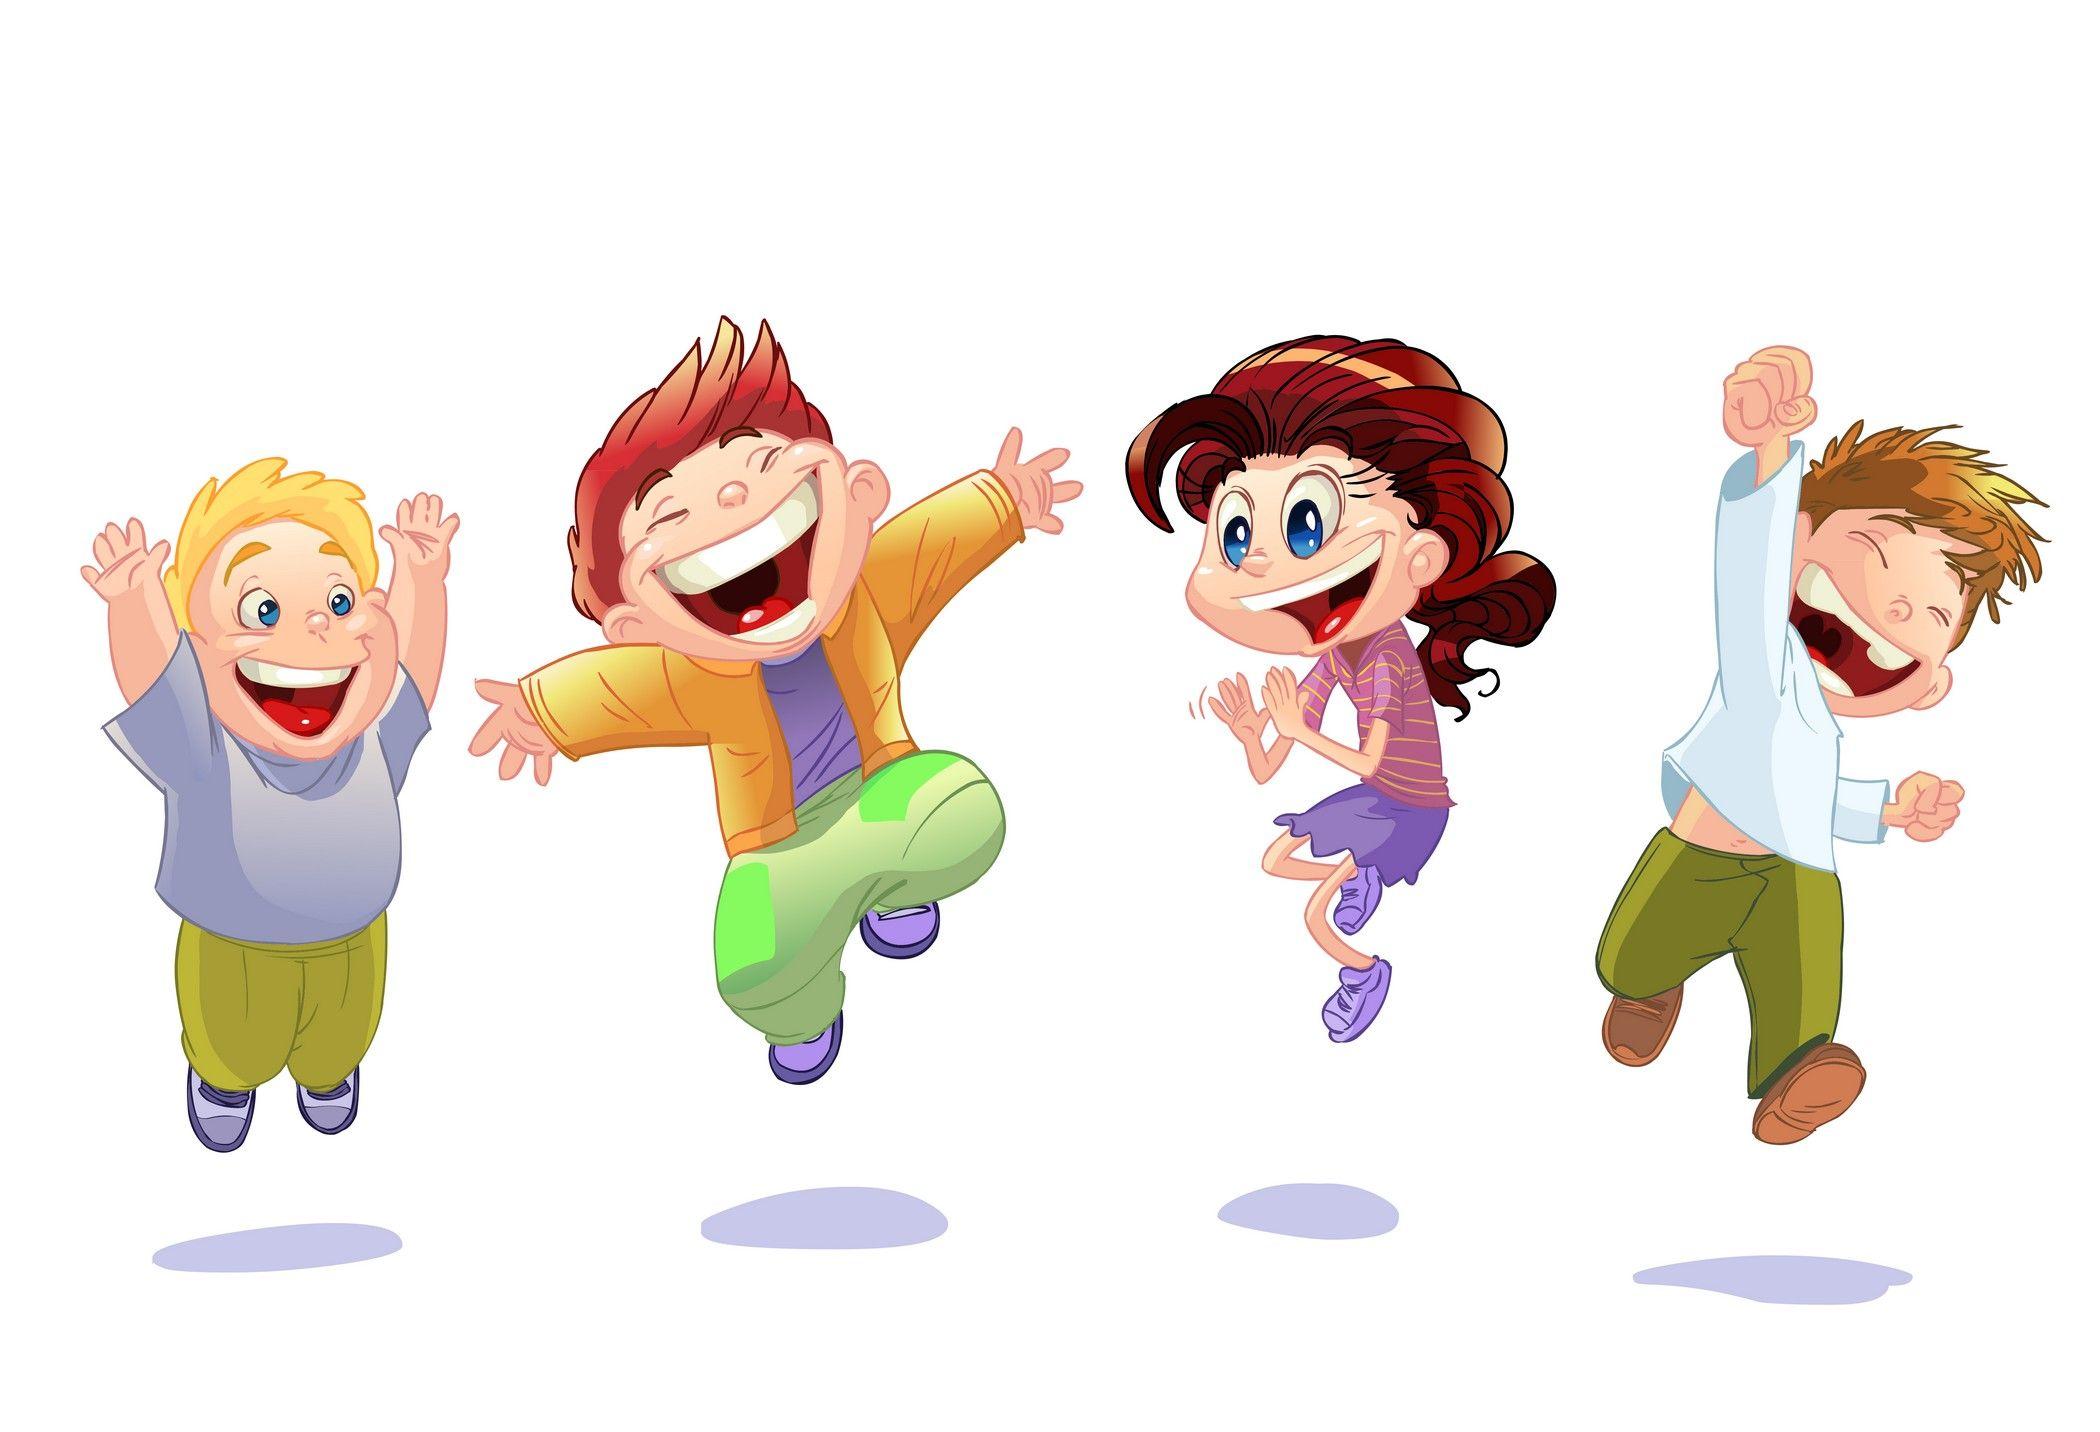 cartoon children kids people 08 - Cartoon Children Images